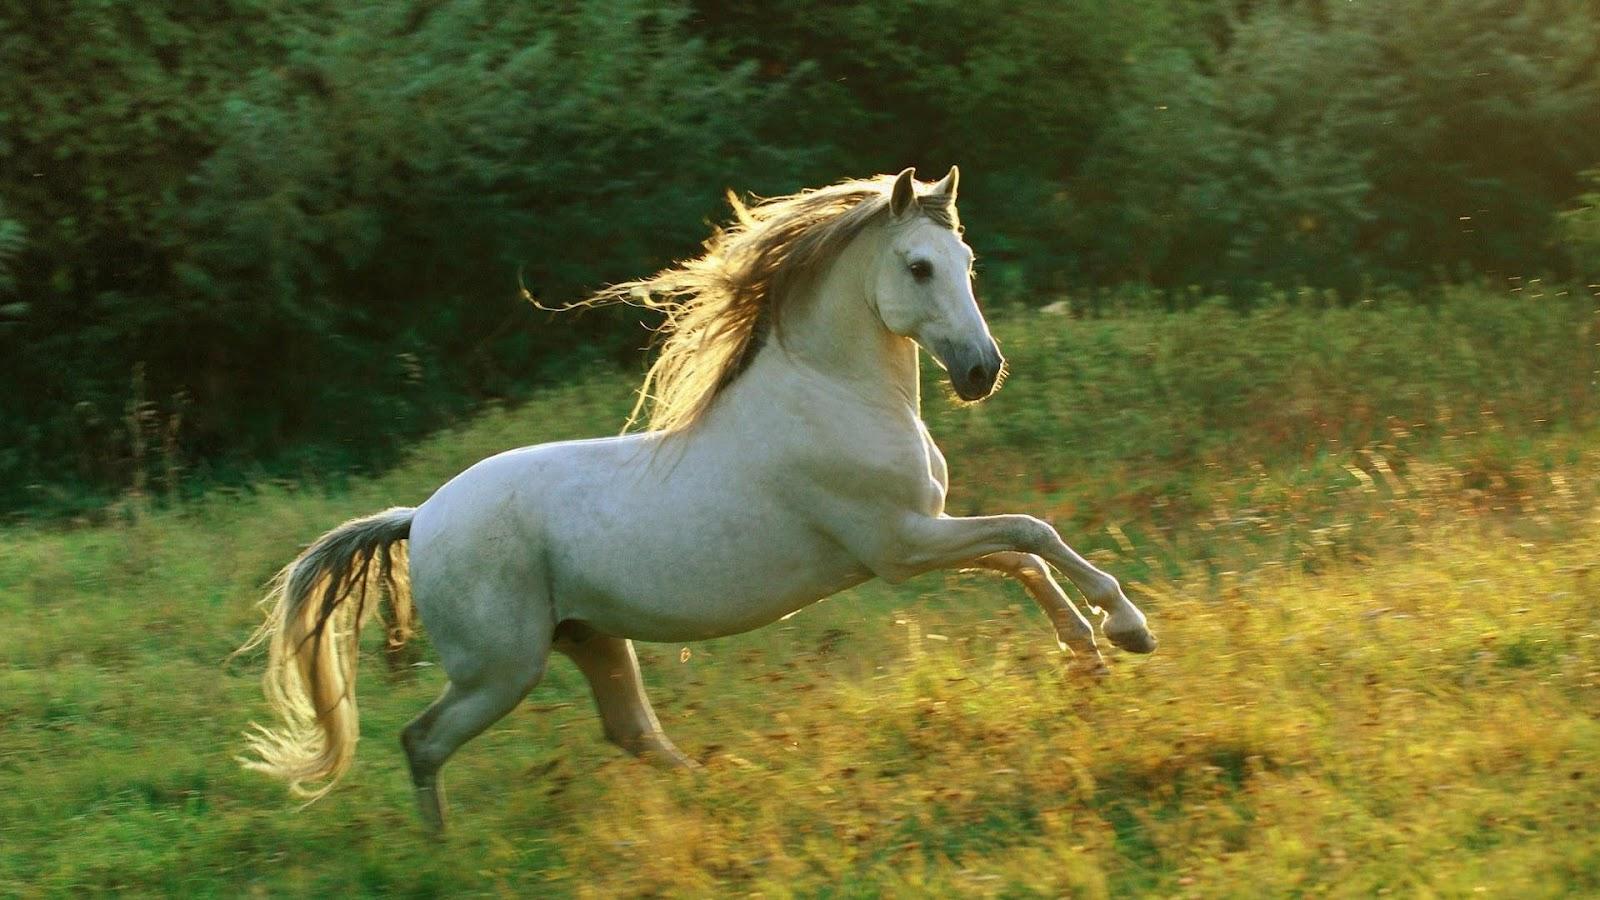 Popular   Wallpaper Horse Epic - MixoPlanet+%2812%29  Image_604334.jpg